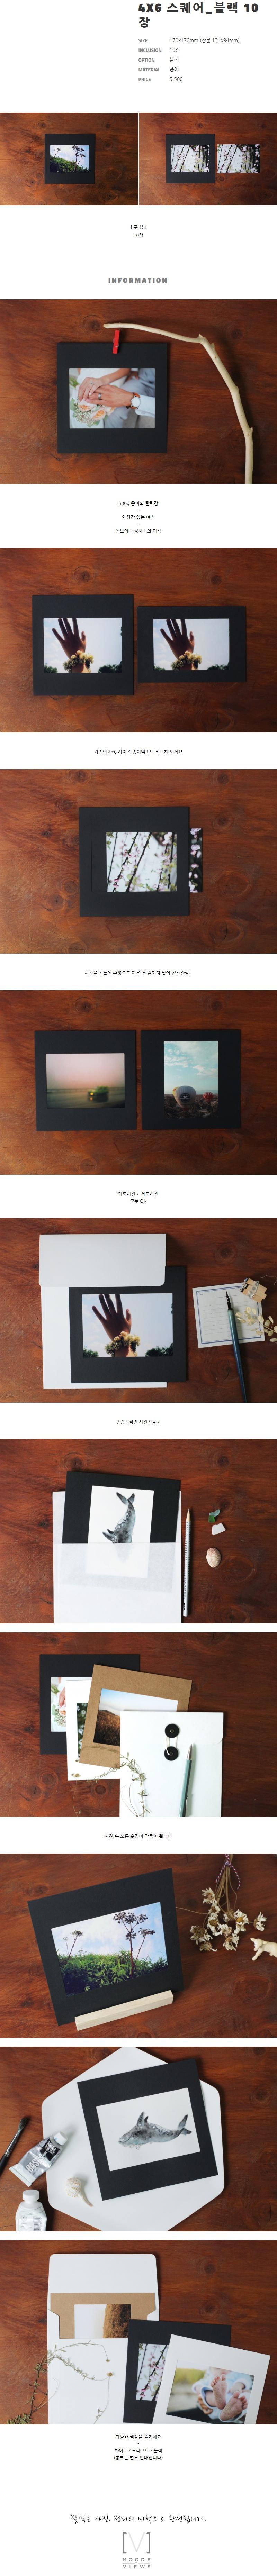 4X6 스퀘어 BLACK 10장 - 무즈앤뷰즈, 5,500원, 테마앨범/테마북, 포토박스/프레임